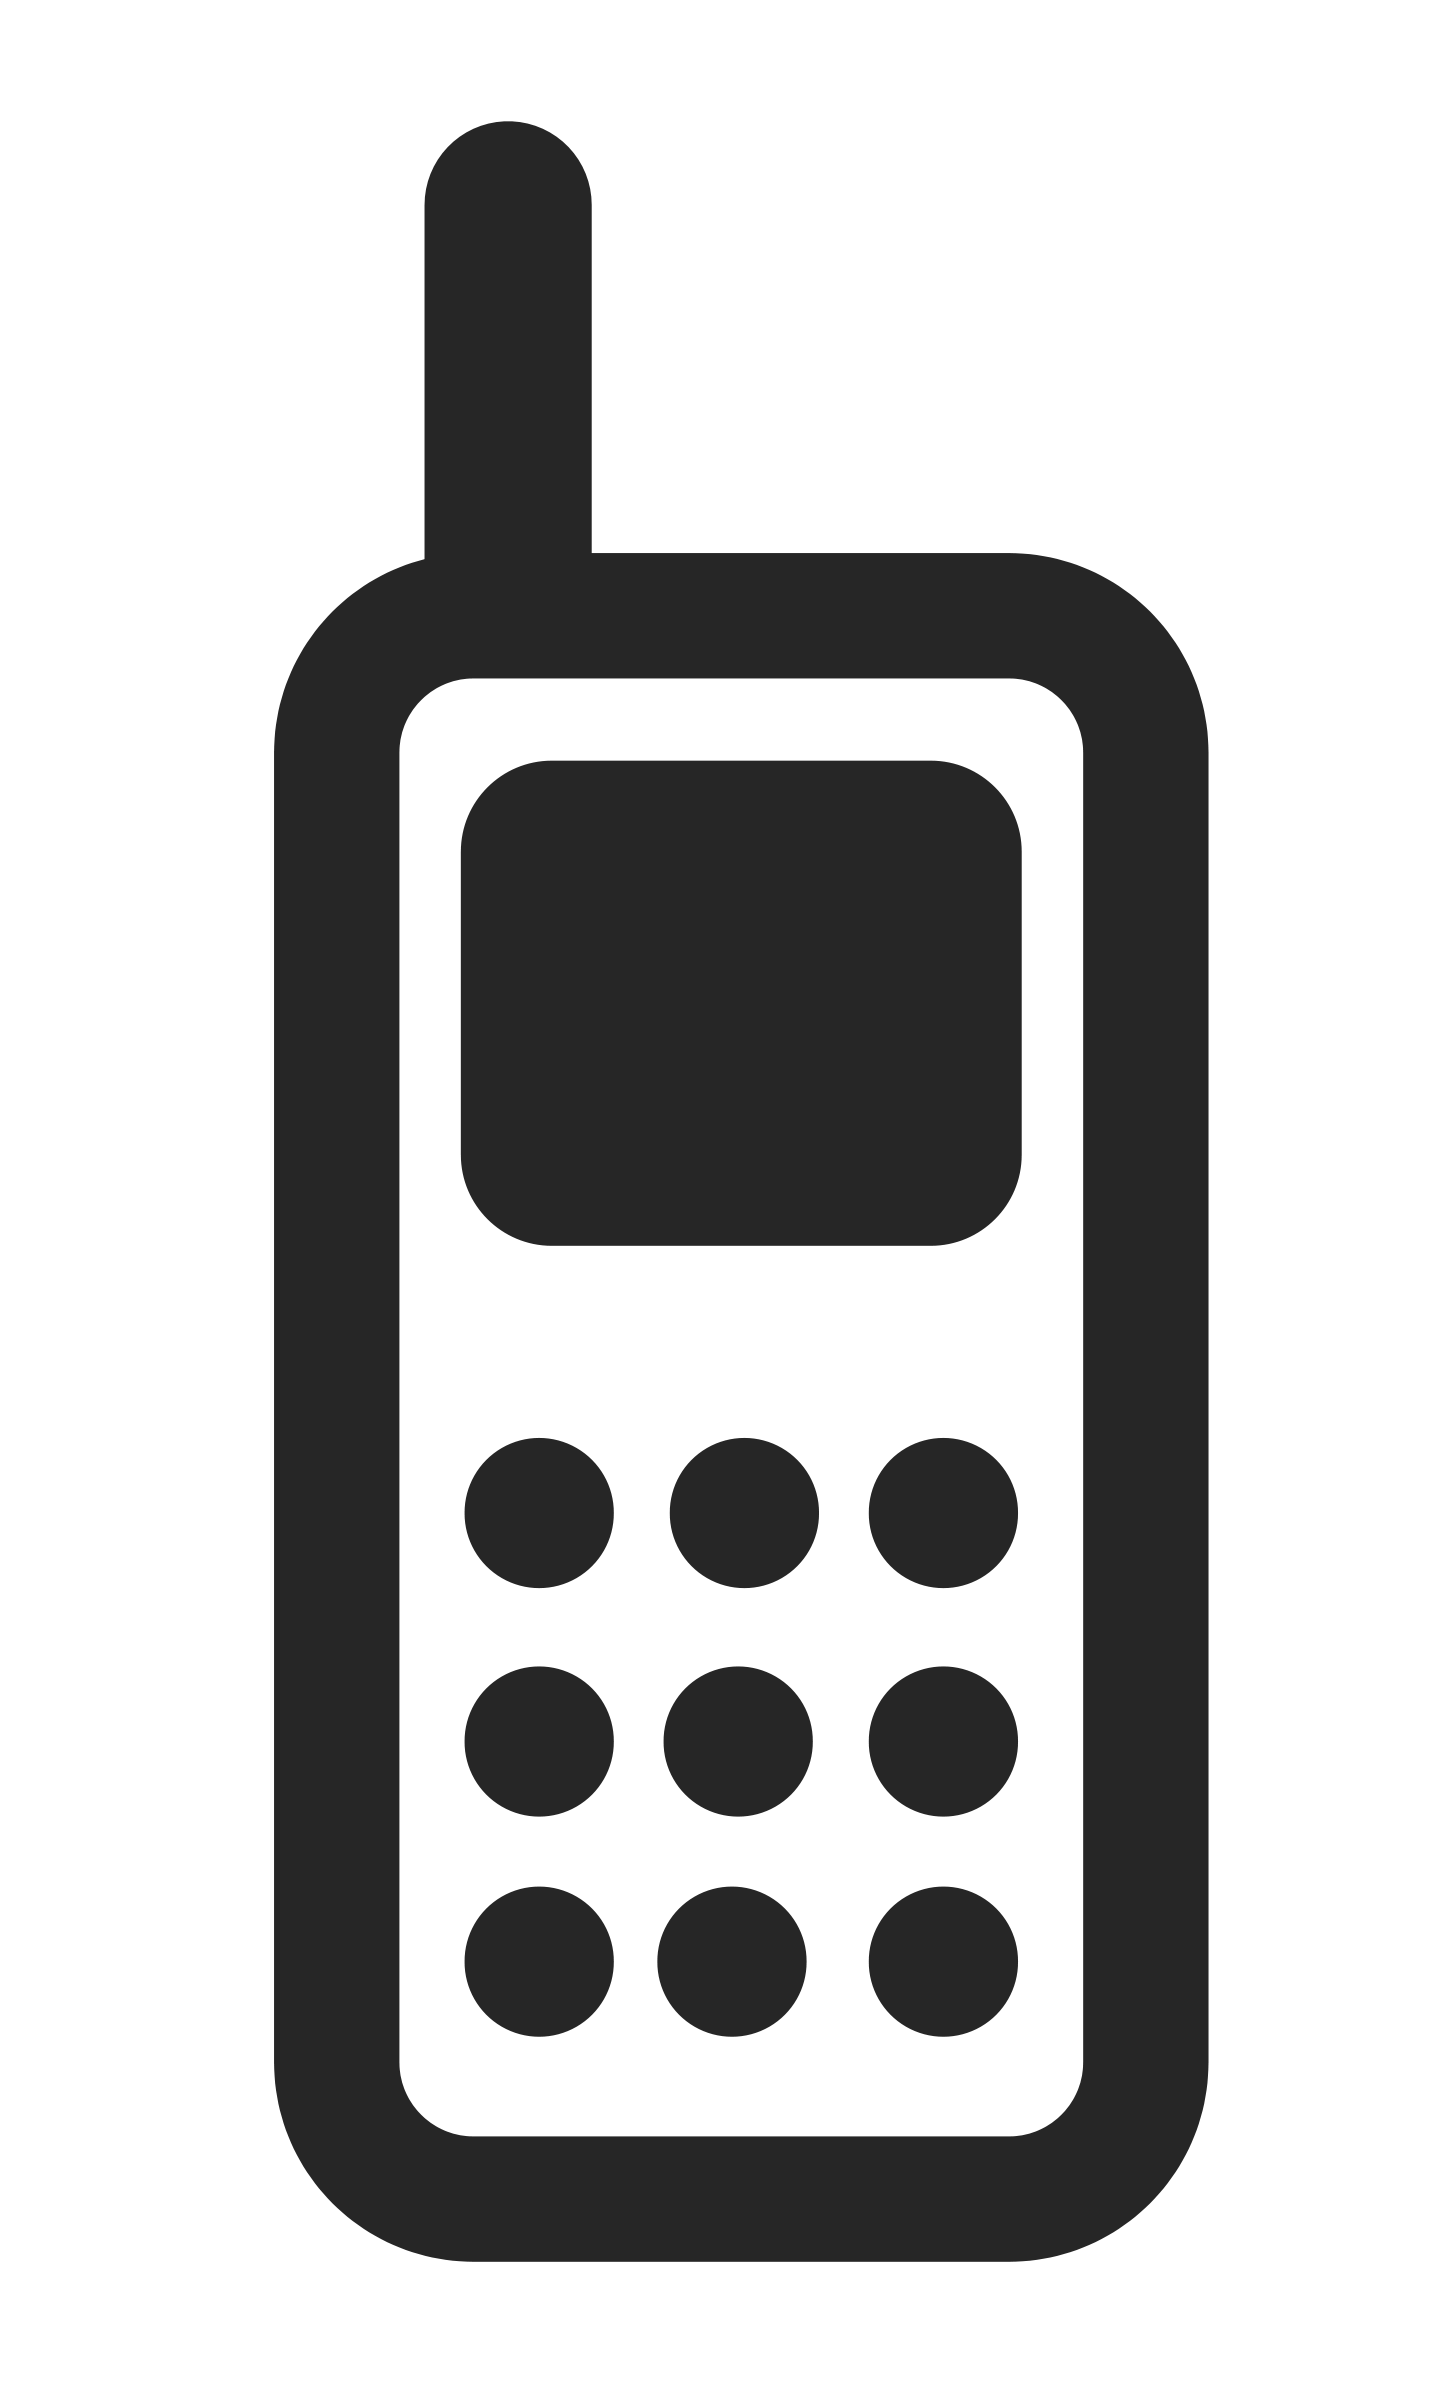 Telephone clipart mobile logo Mobile 50 Phone Se Clip